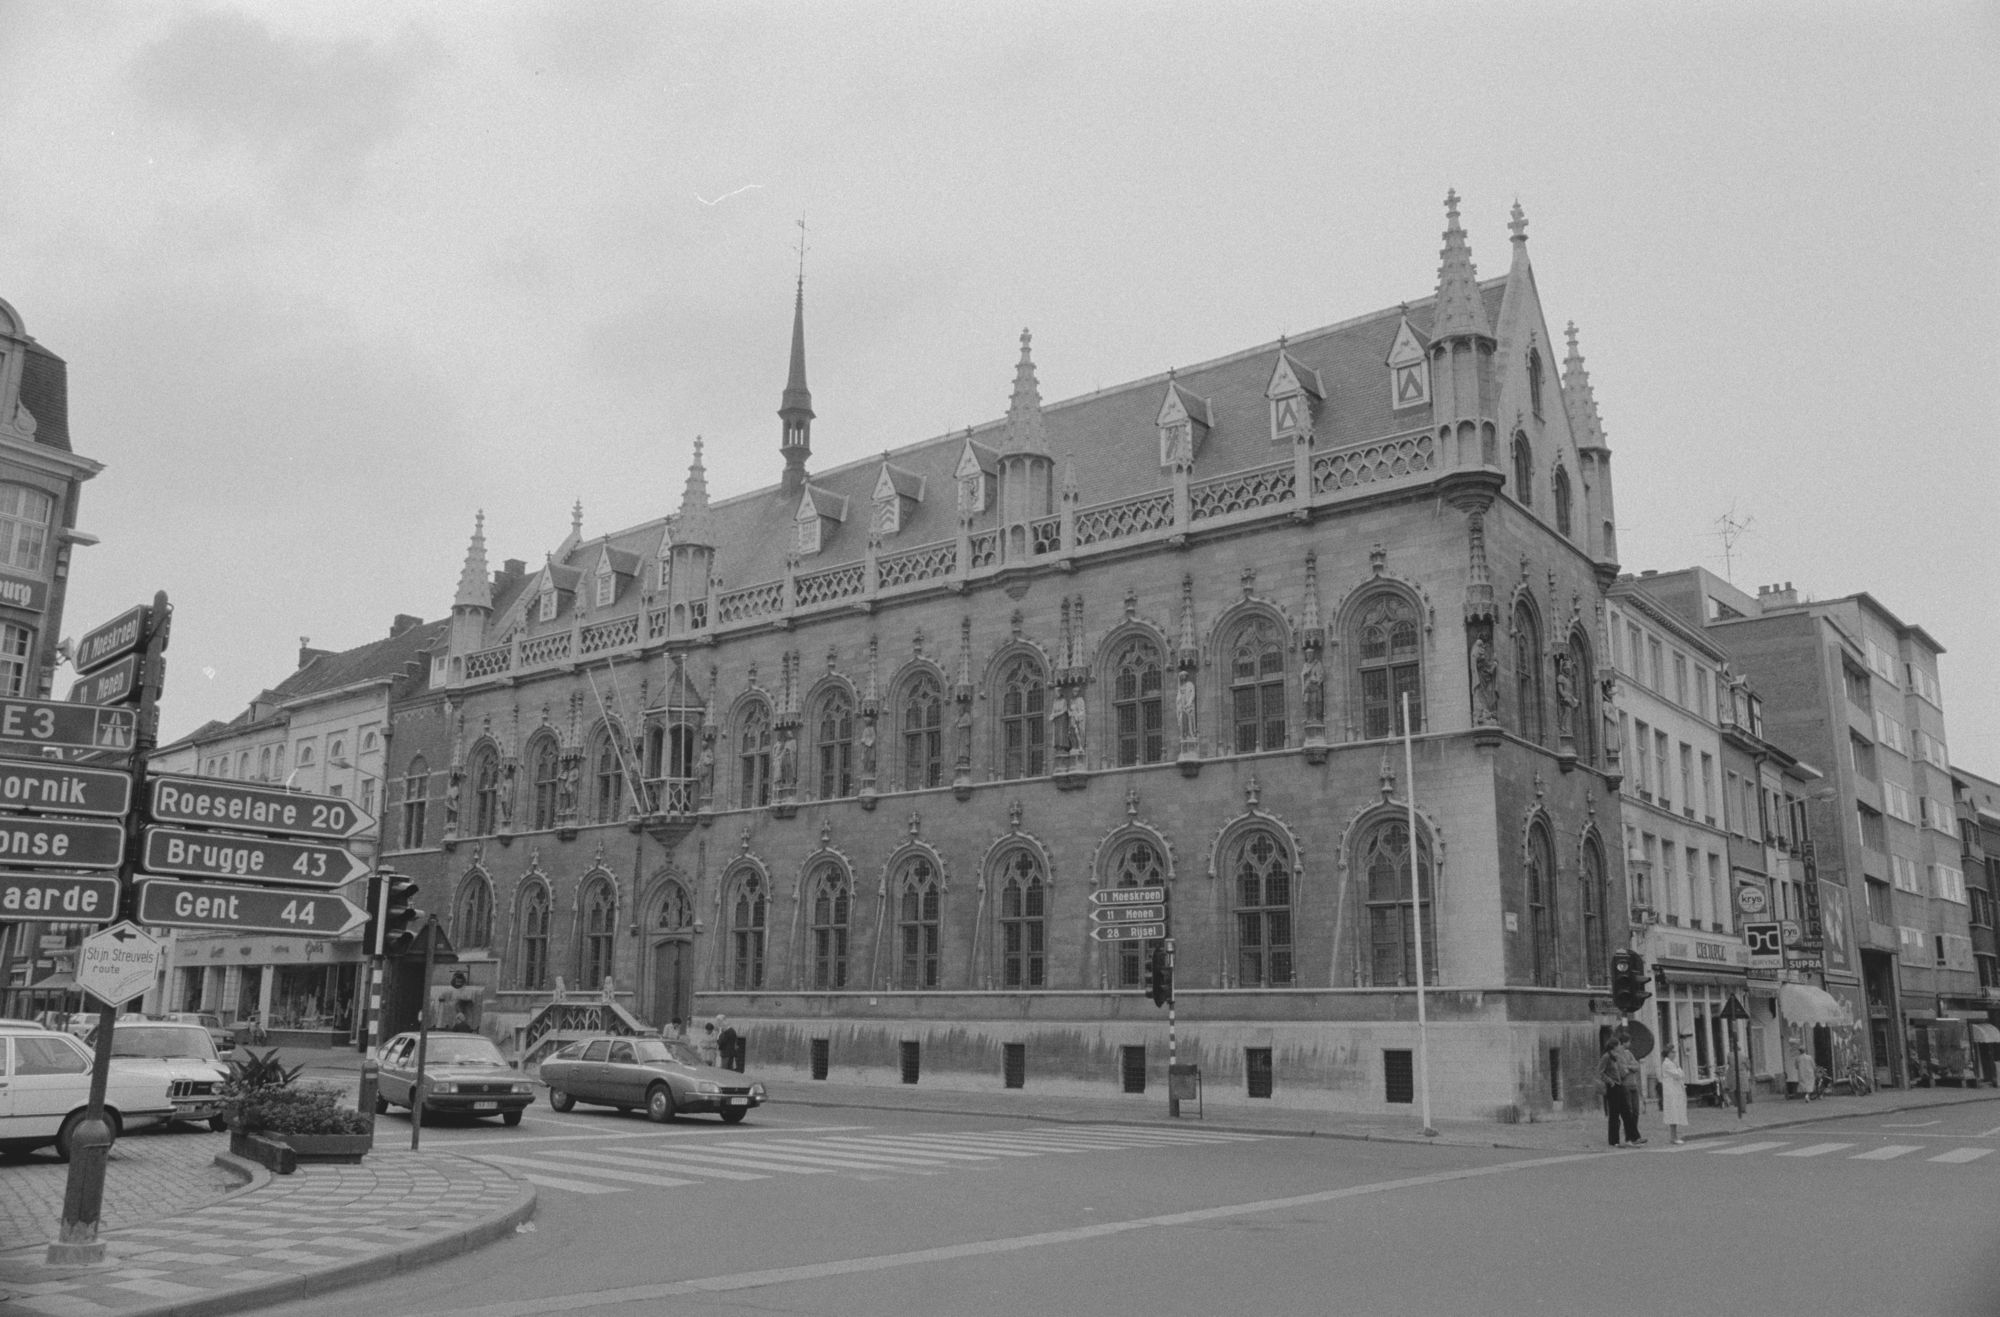 Stadsbeelden: stadhuis